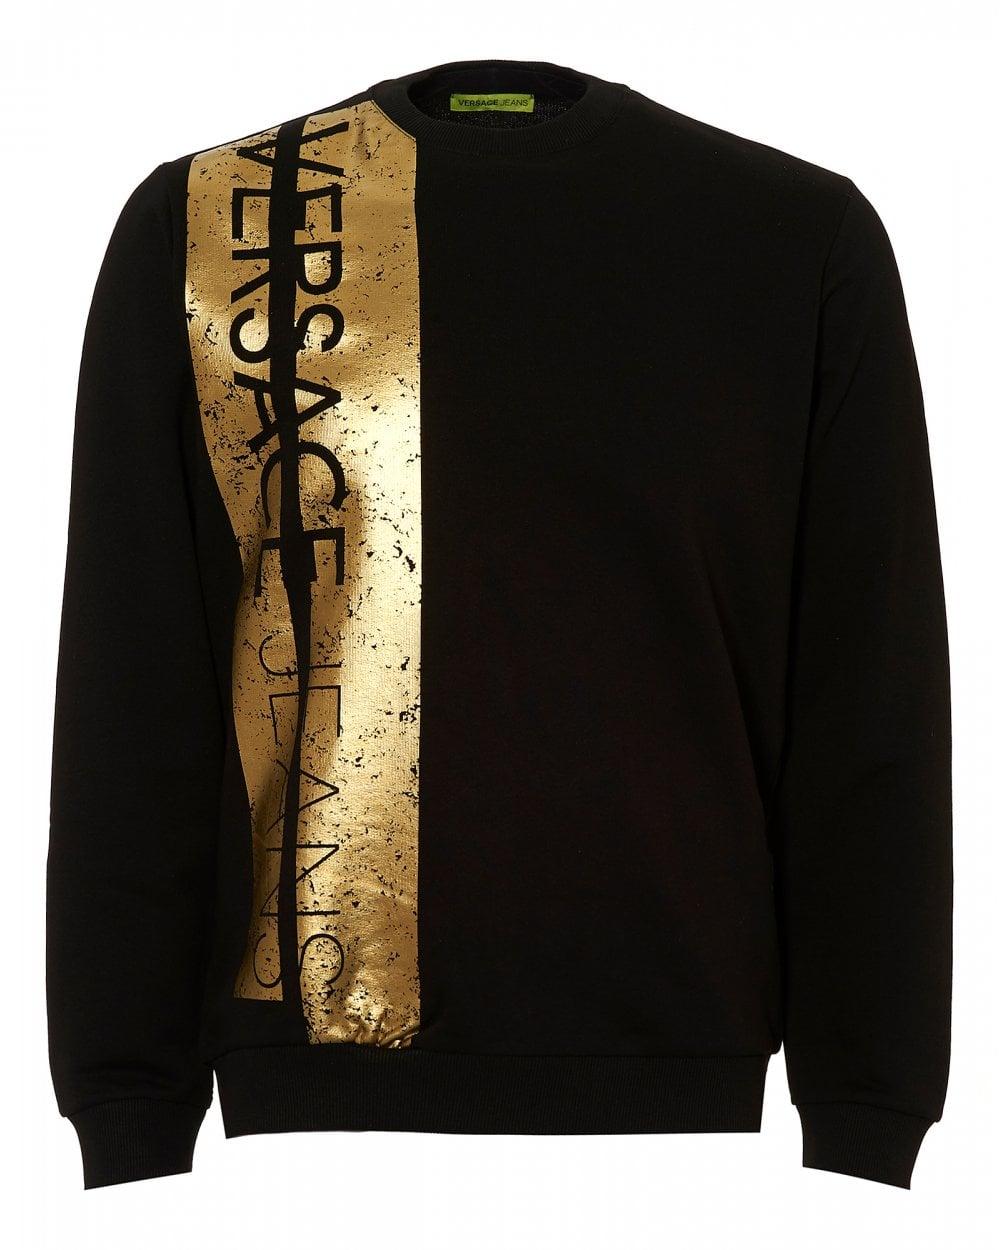 1eb67fad2cd Versace Jeans Mens Foiled Gold Strip Sweatshirt